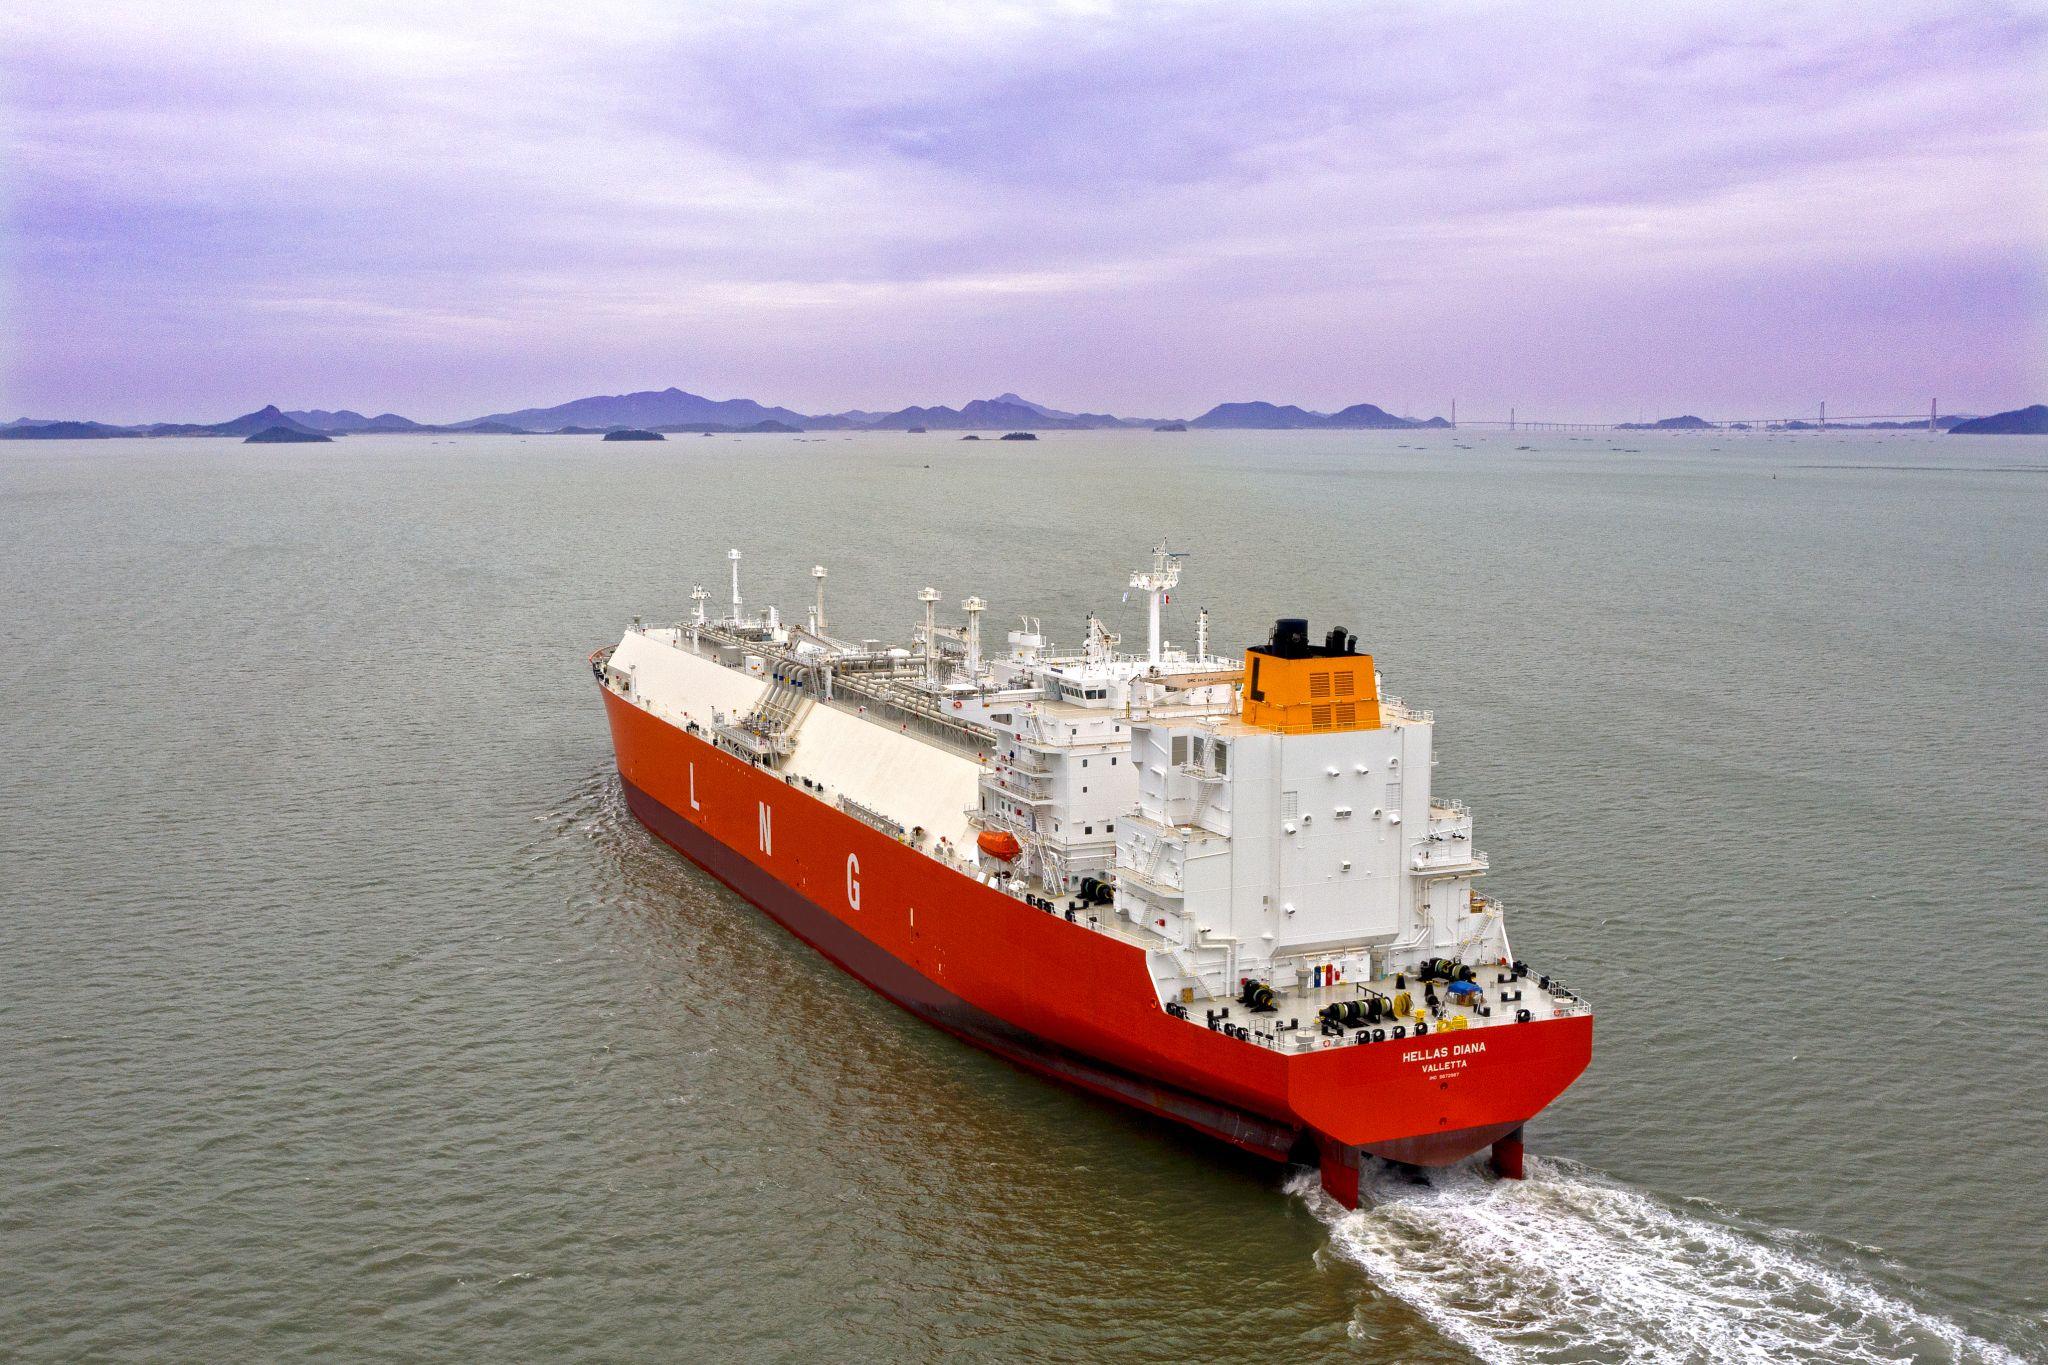 Second LNG newbuild joins Latsco's fleet